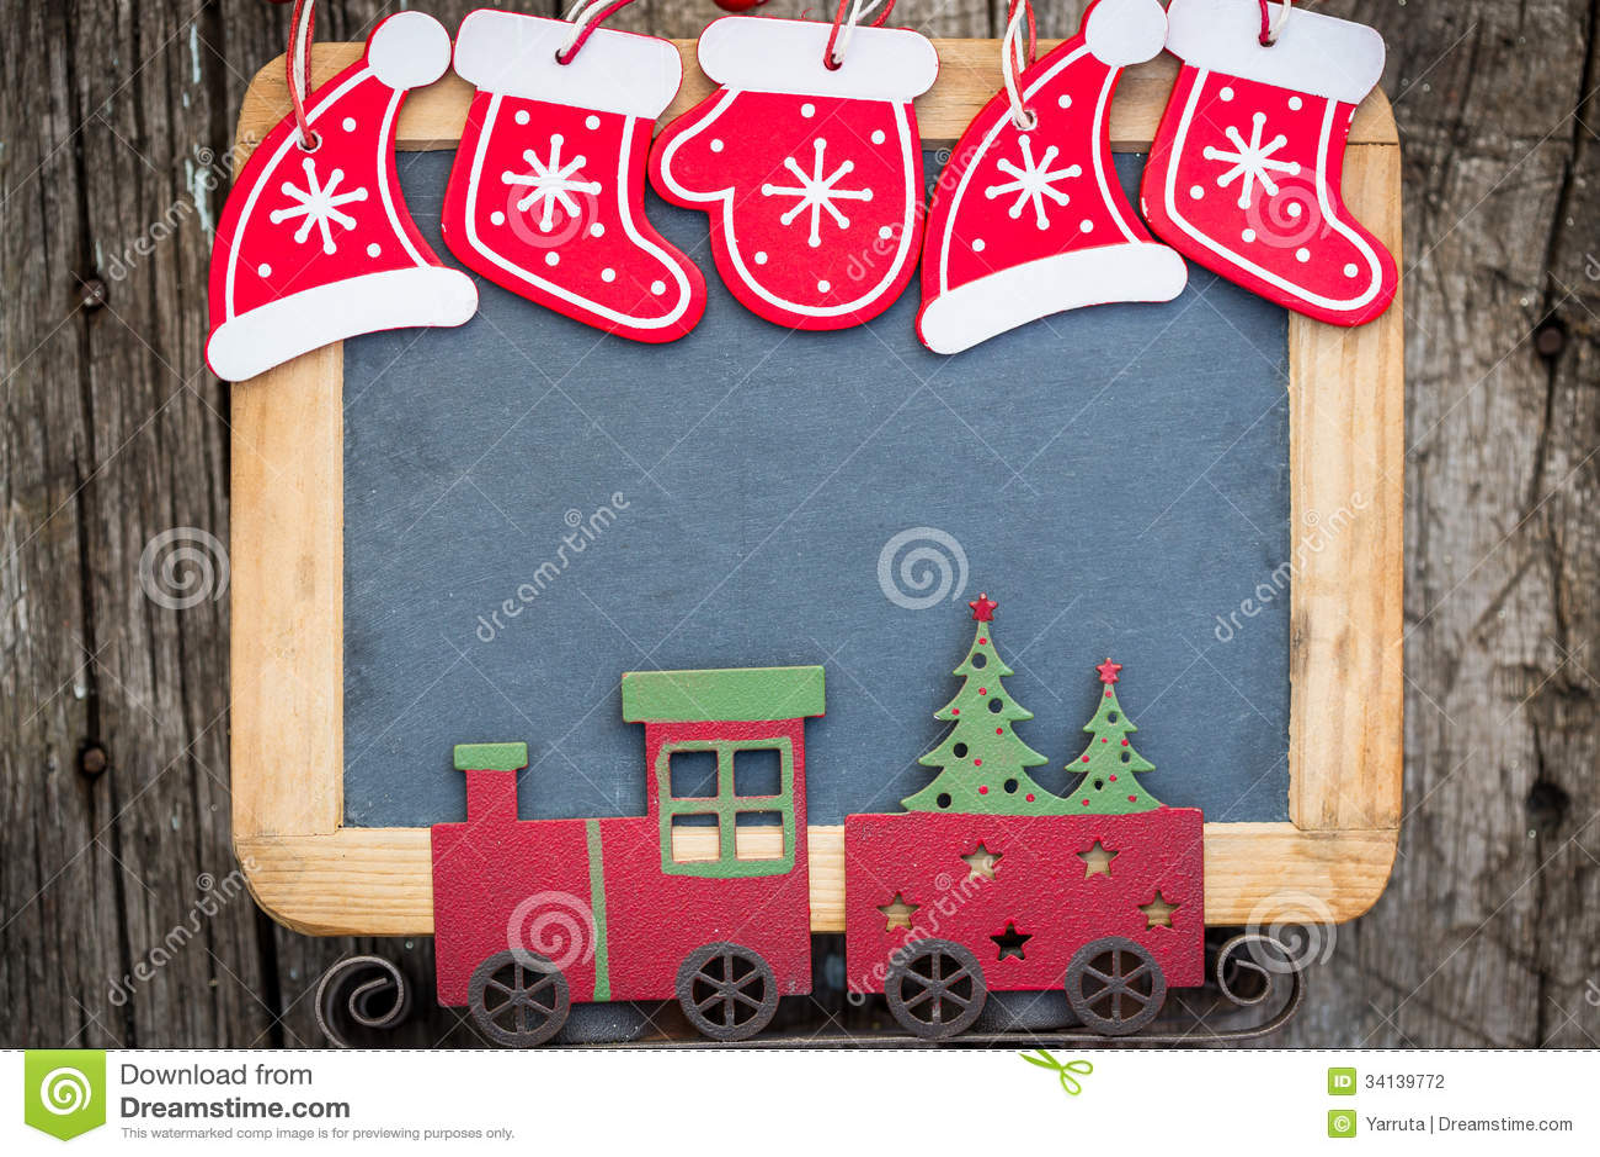 Christmas Tree Decorations Border On Vintage Wooden